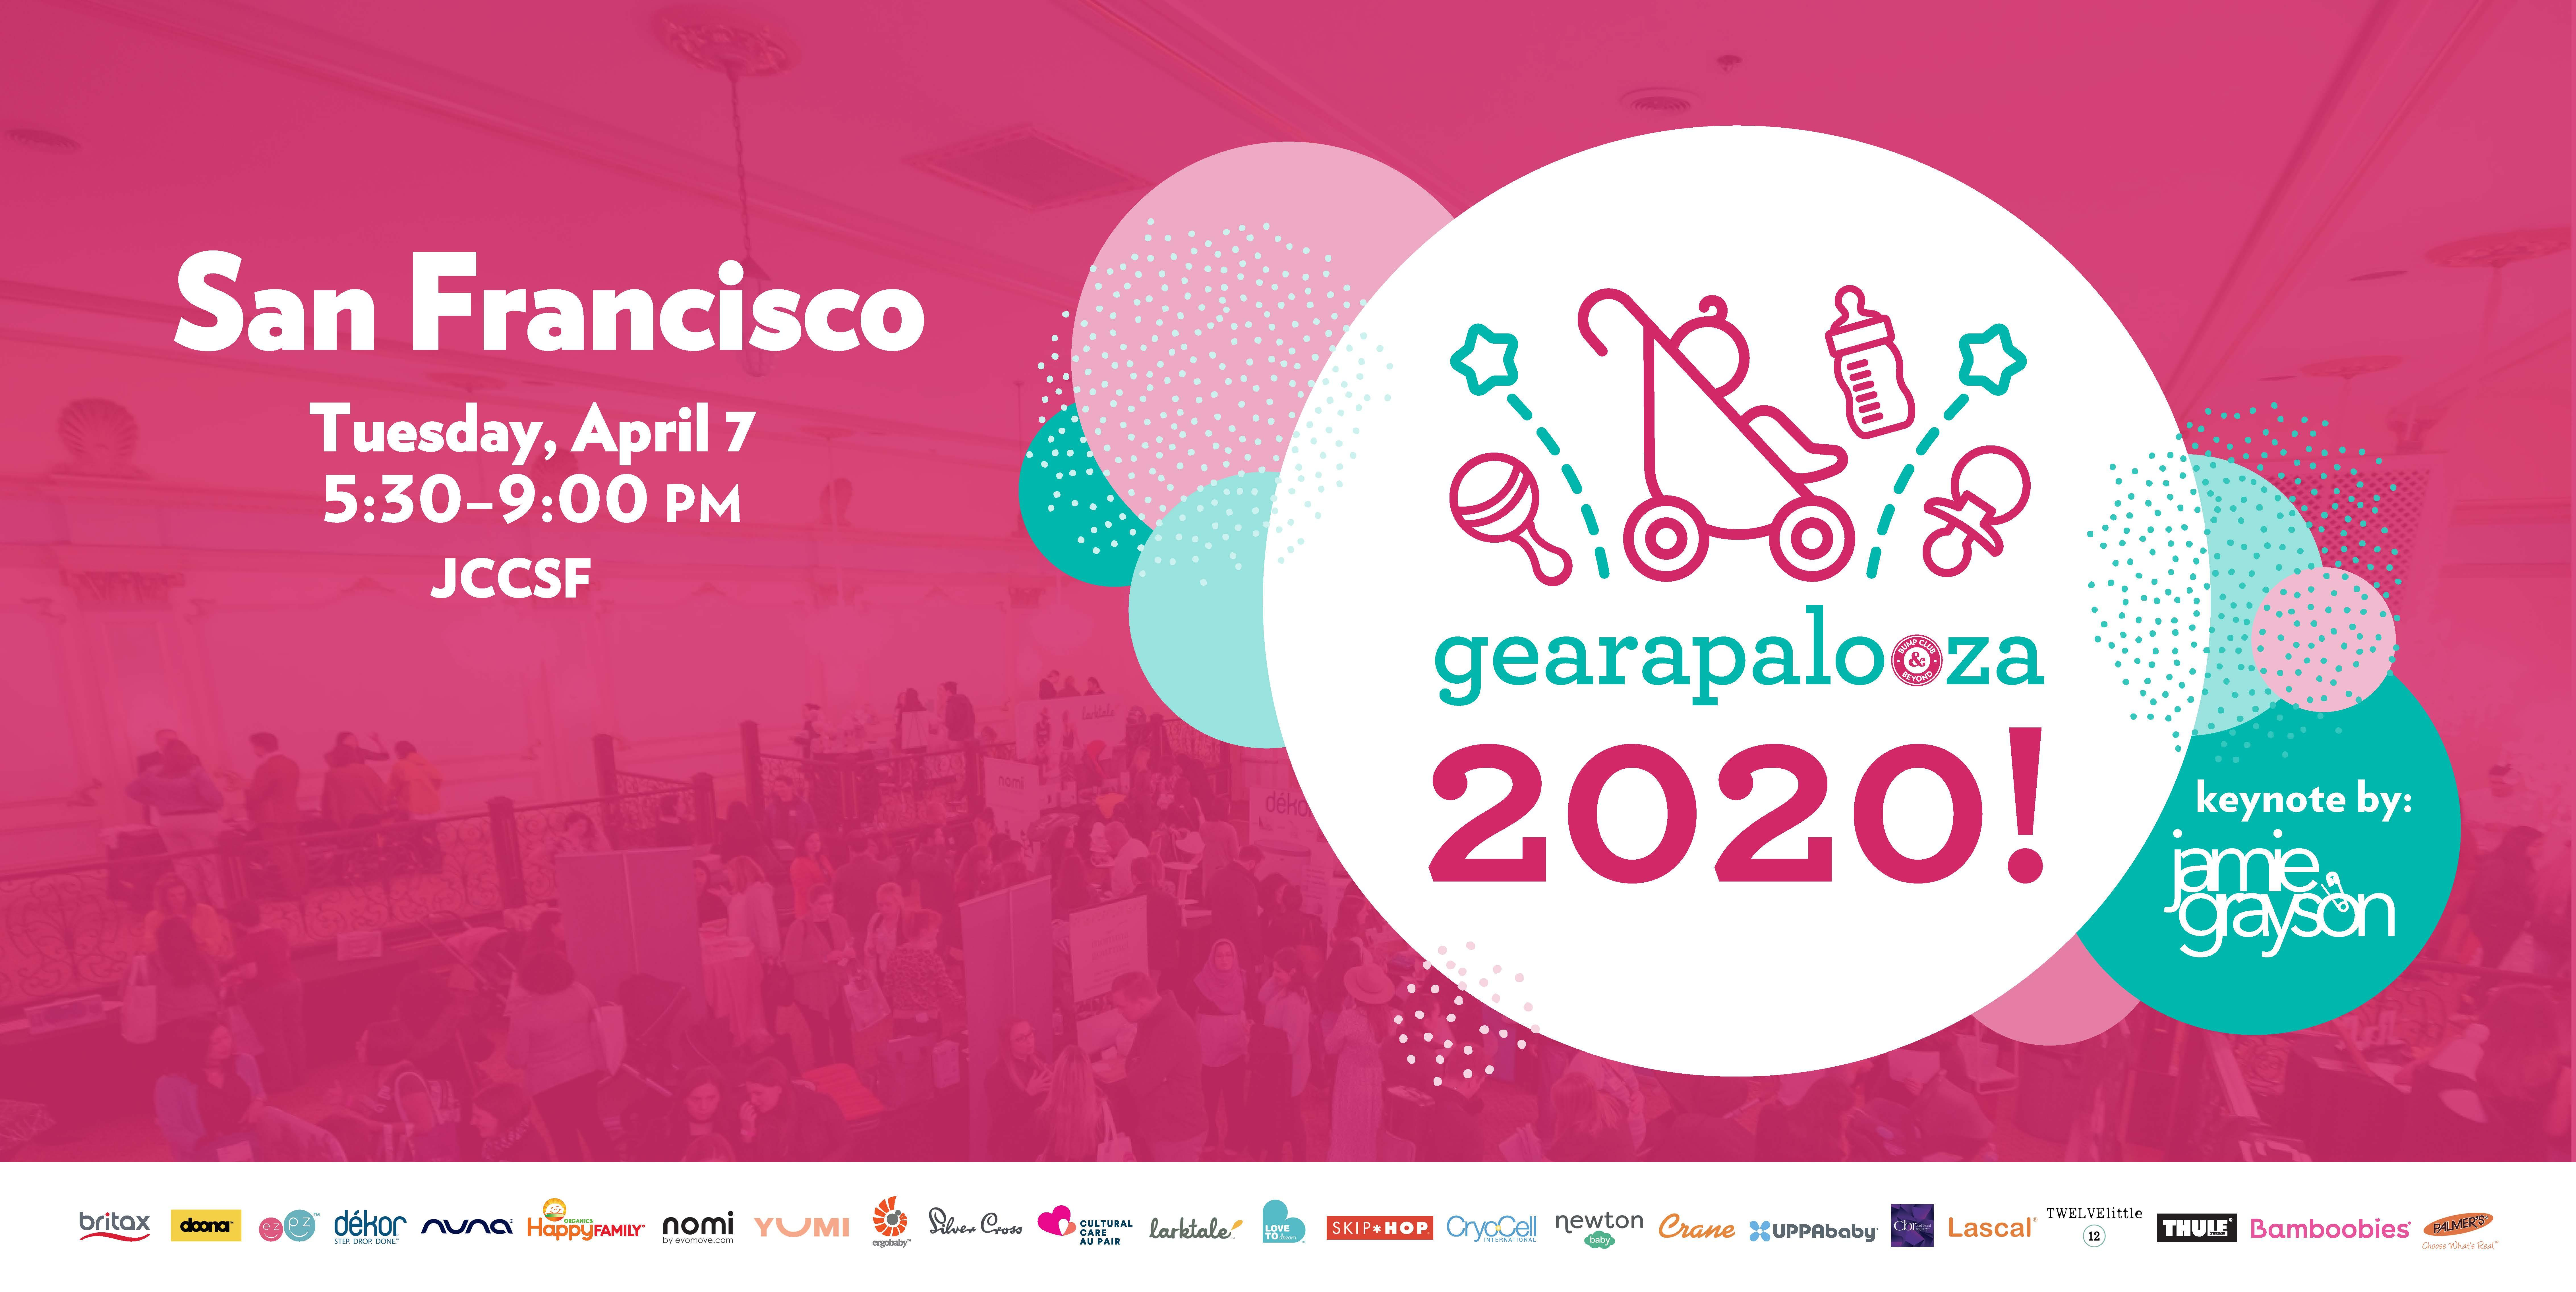 Gearapalooza San Francisco 2020